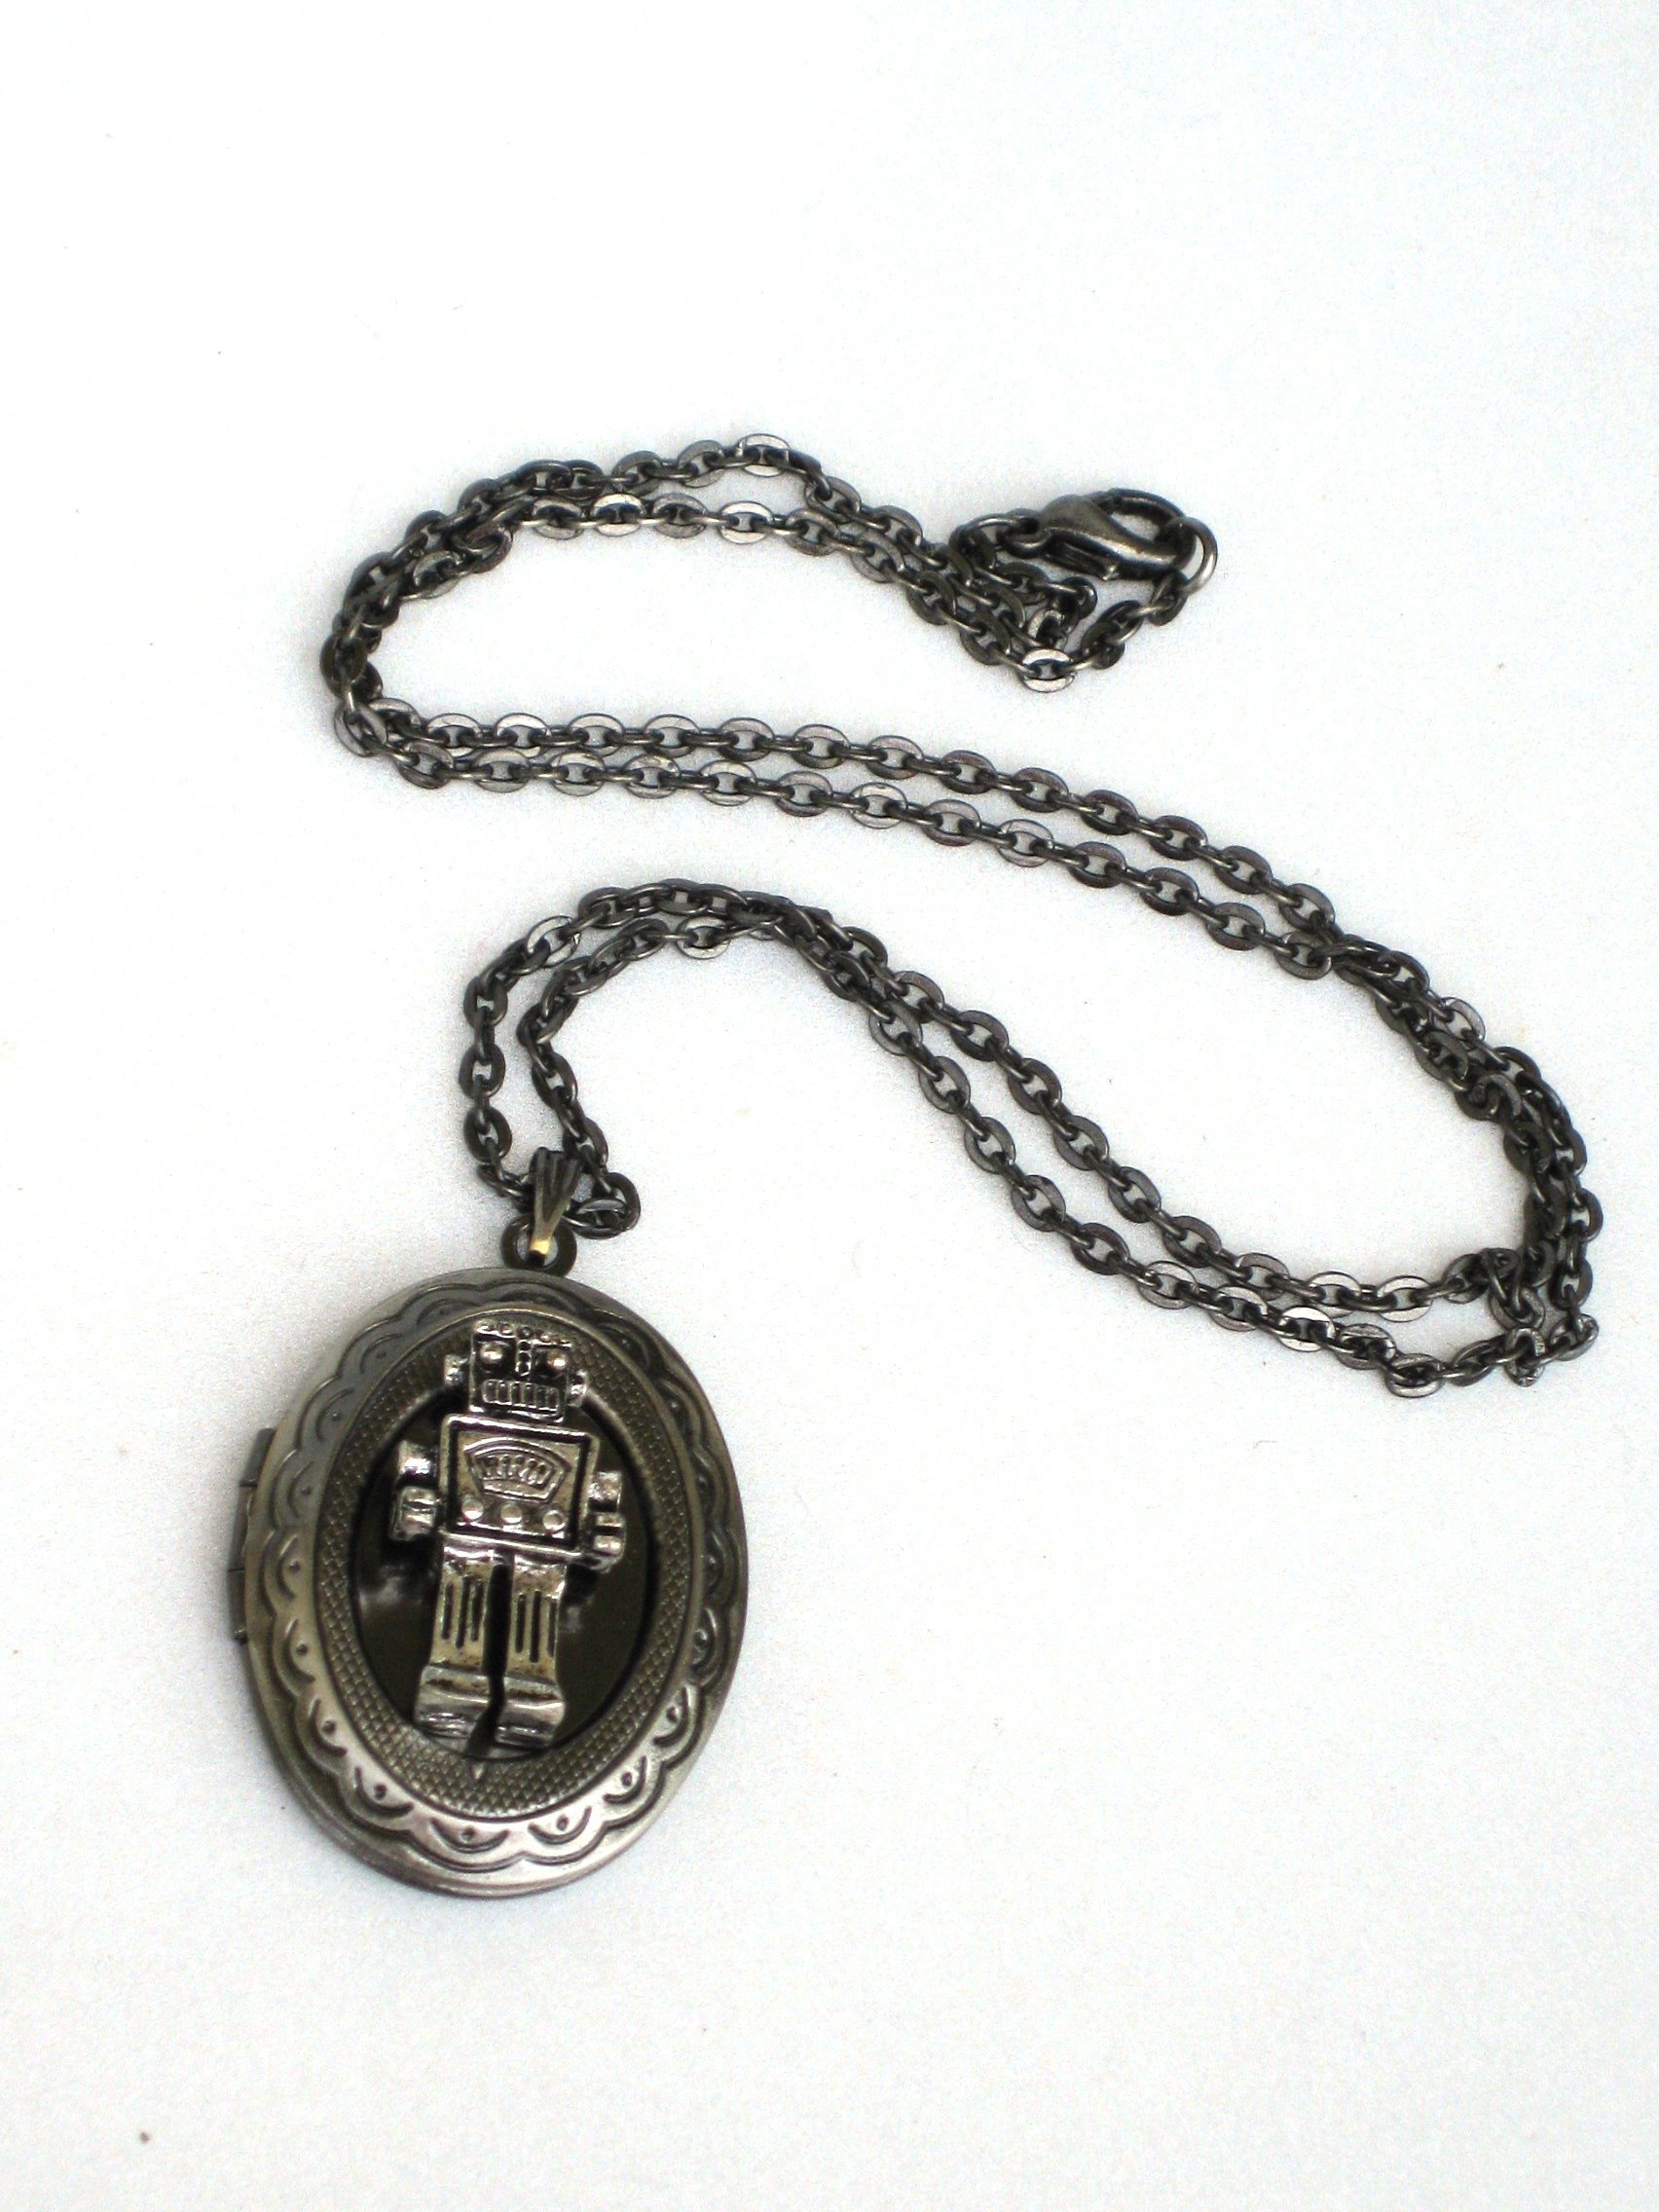 Steampunk Mr. Robot - Necklace Pendant locket